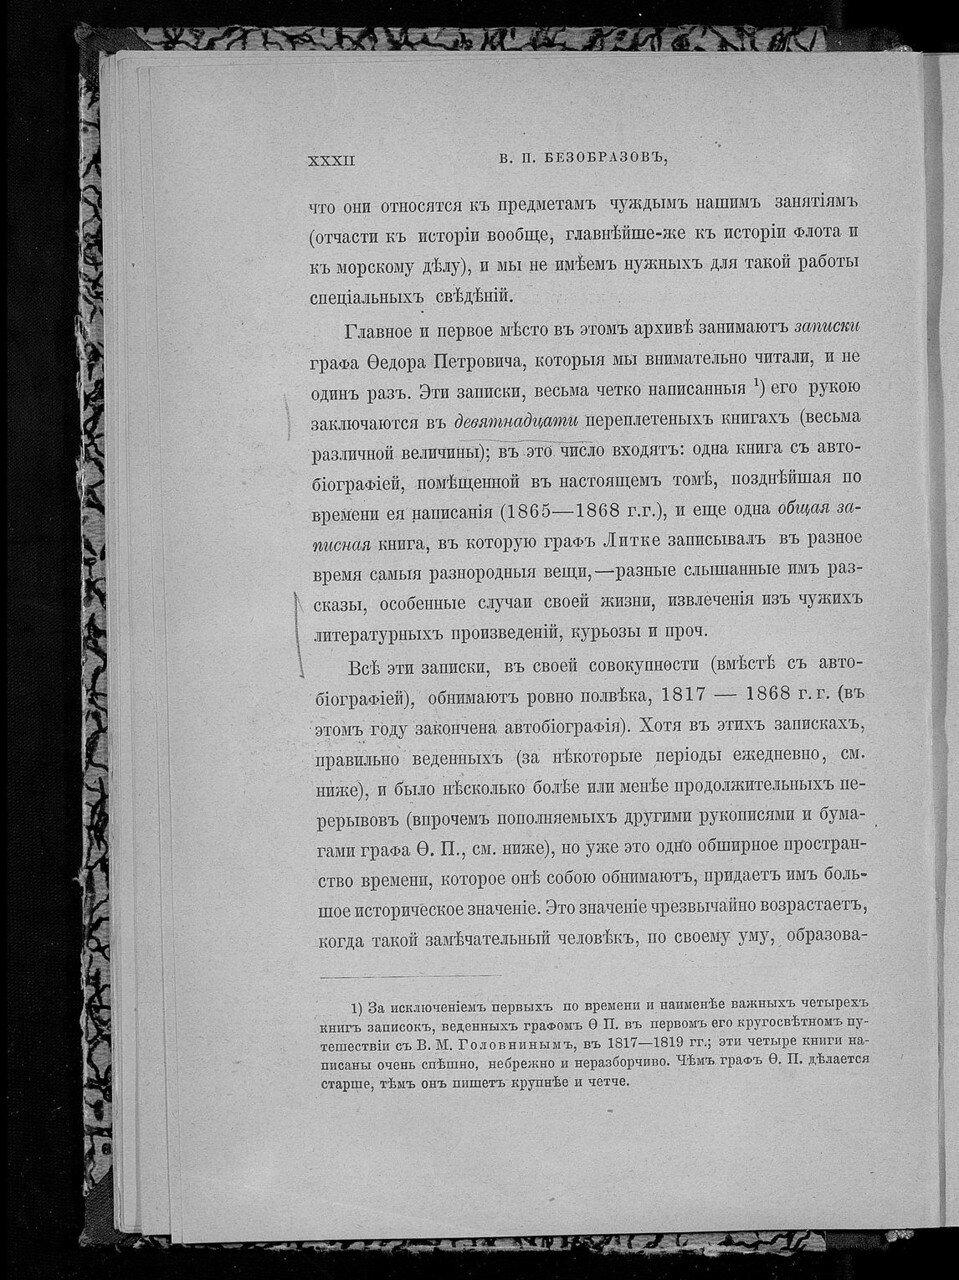 https://img-fotki.yandex.ru/get/900241/199368979.d2/0_21dd72_116e4fd6_XXXL.jpg